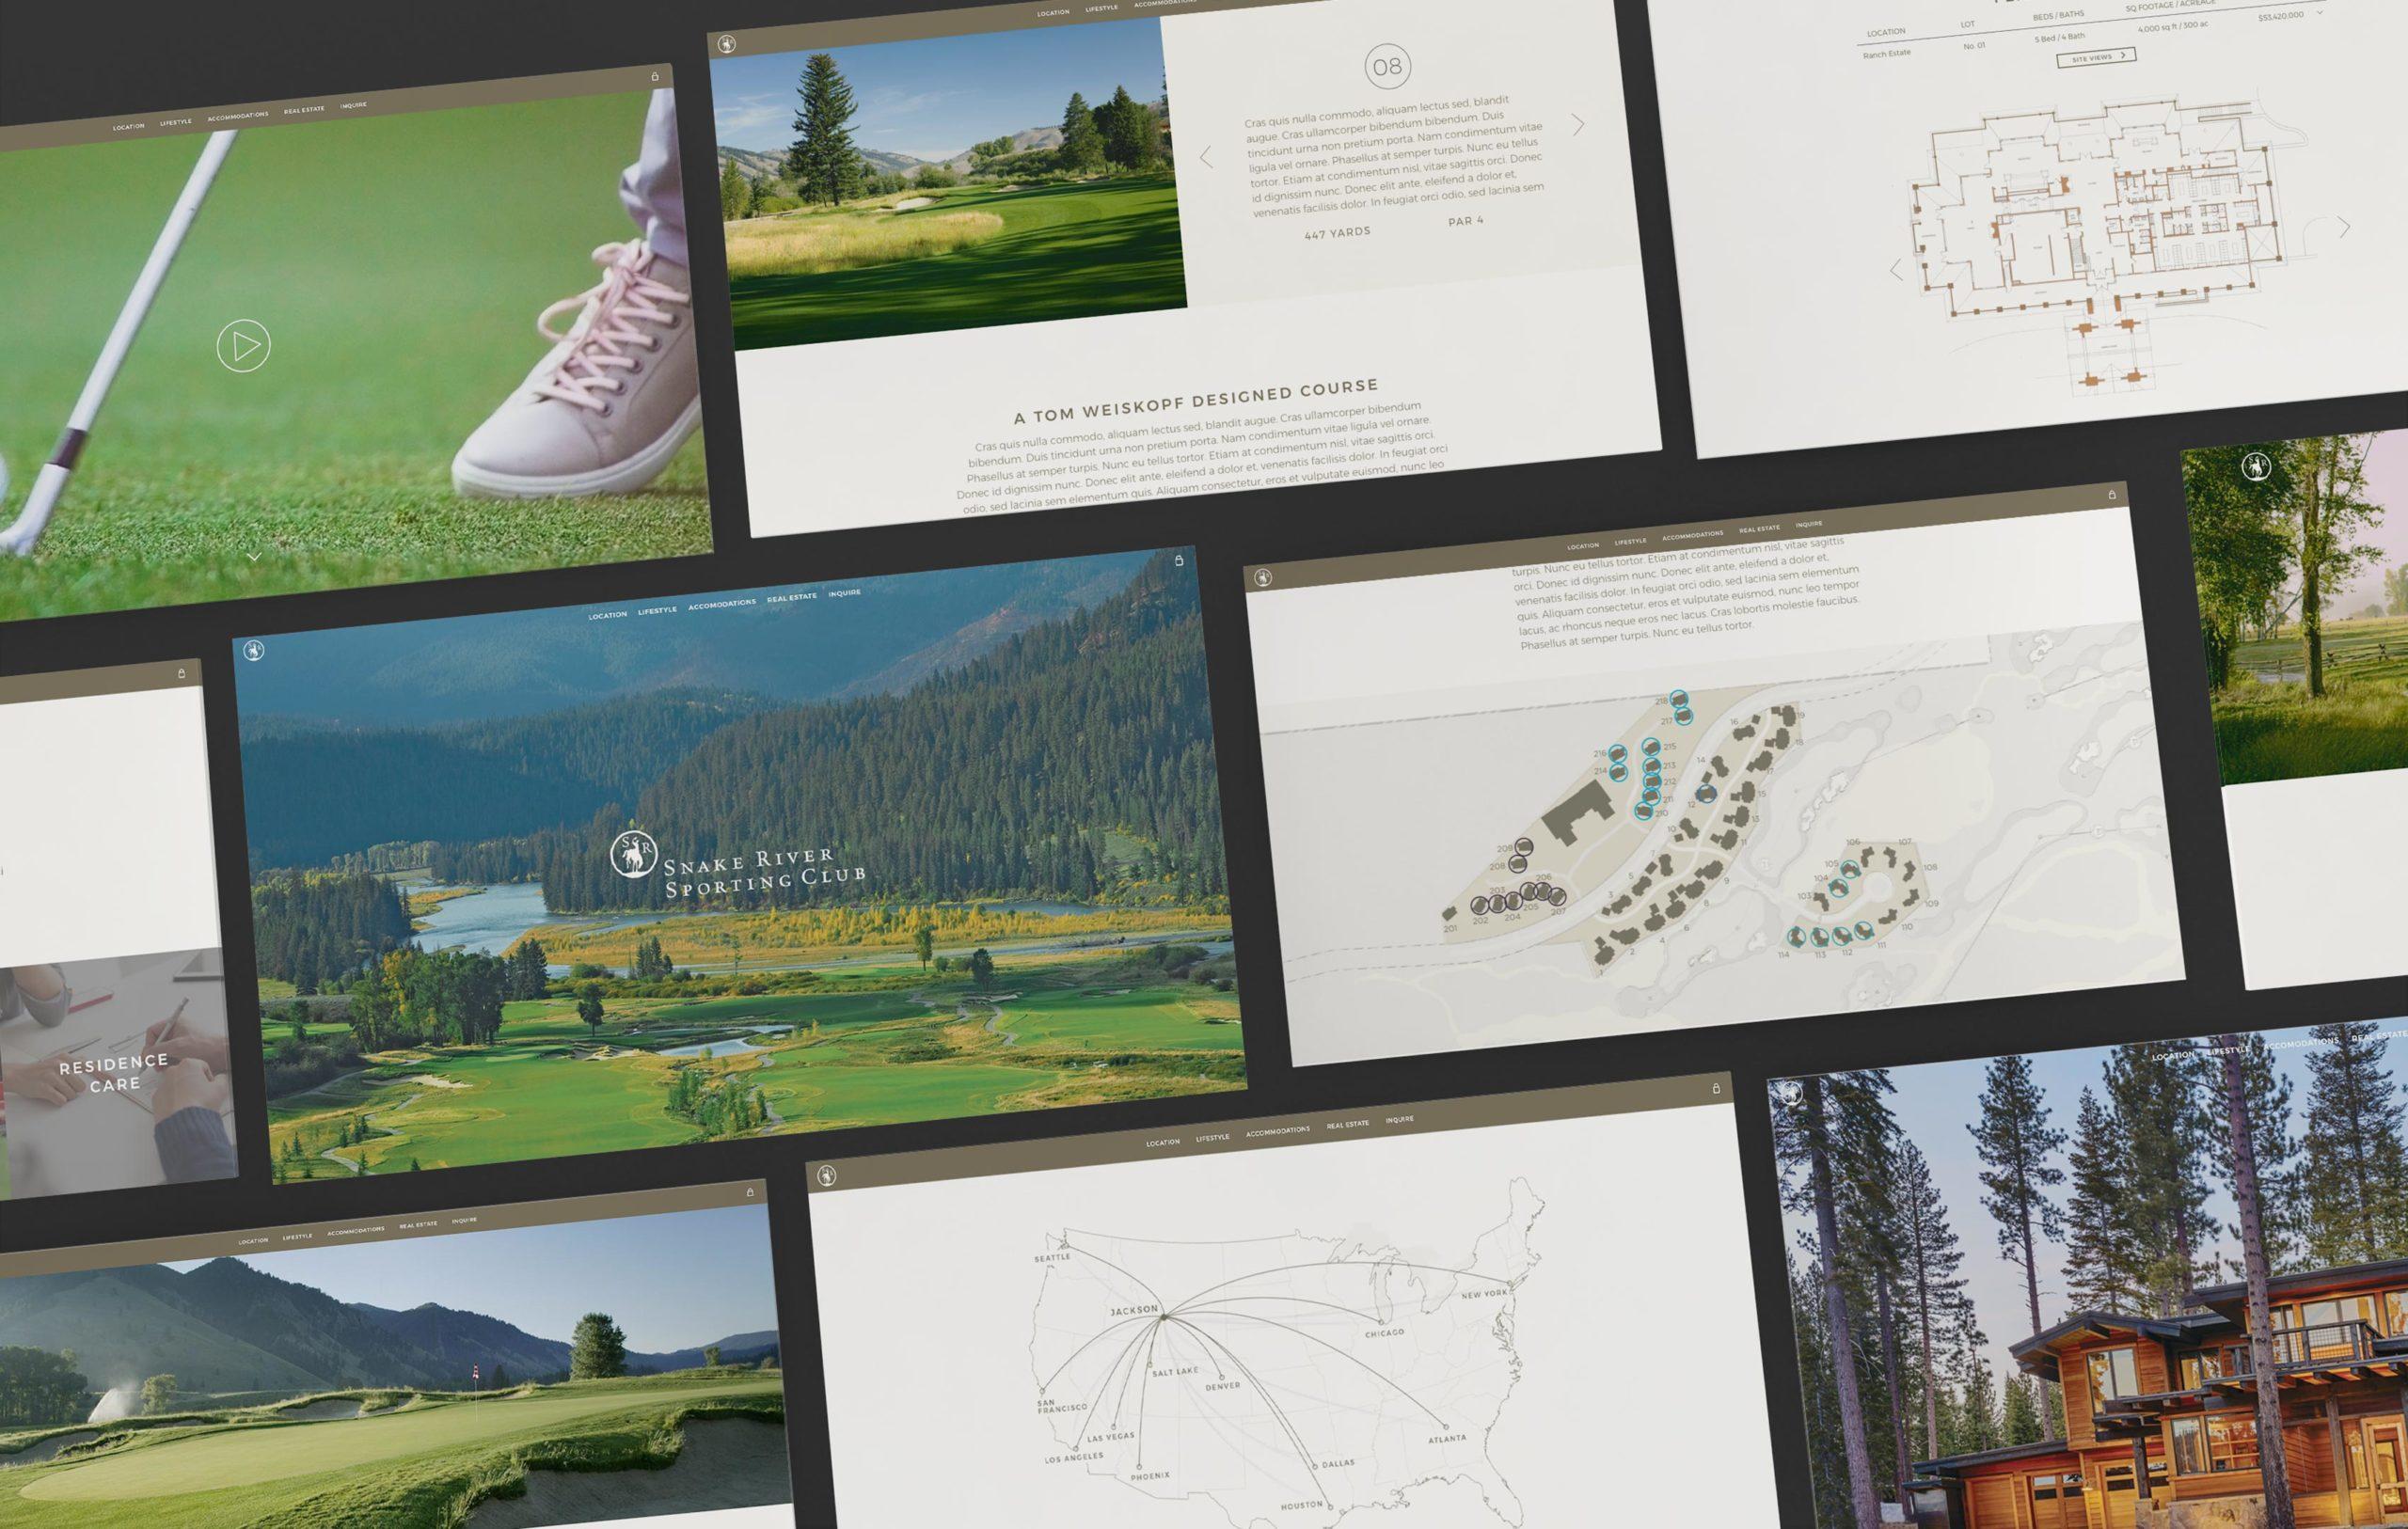 New-Thought-Snake-River-Sporting-Club-Website-Design-Mosaic-fullscreen